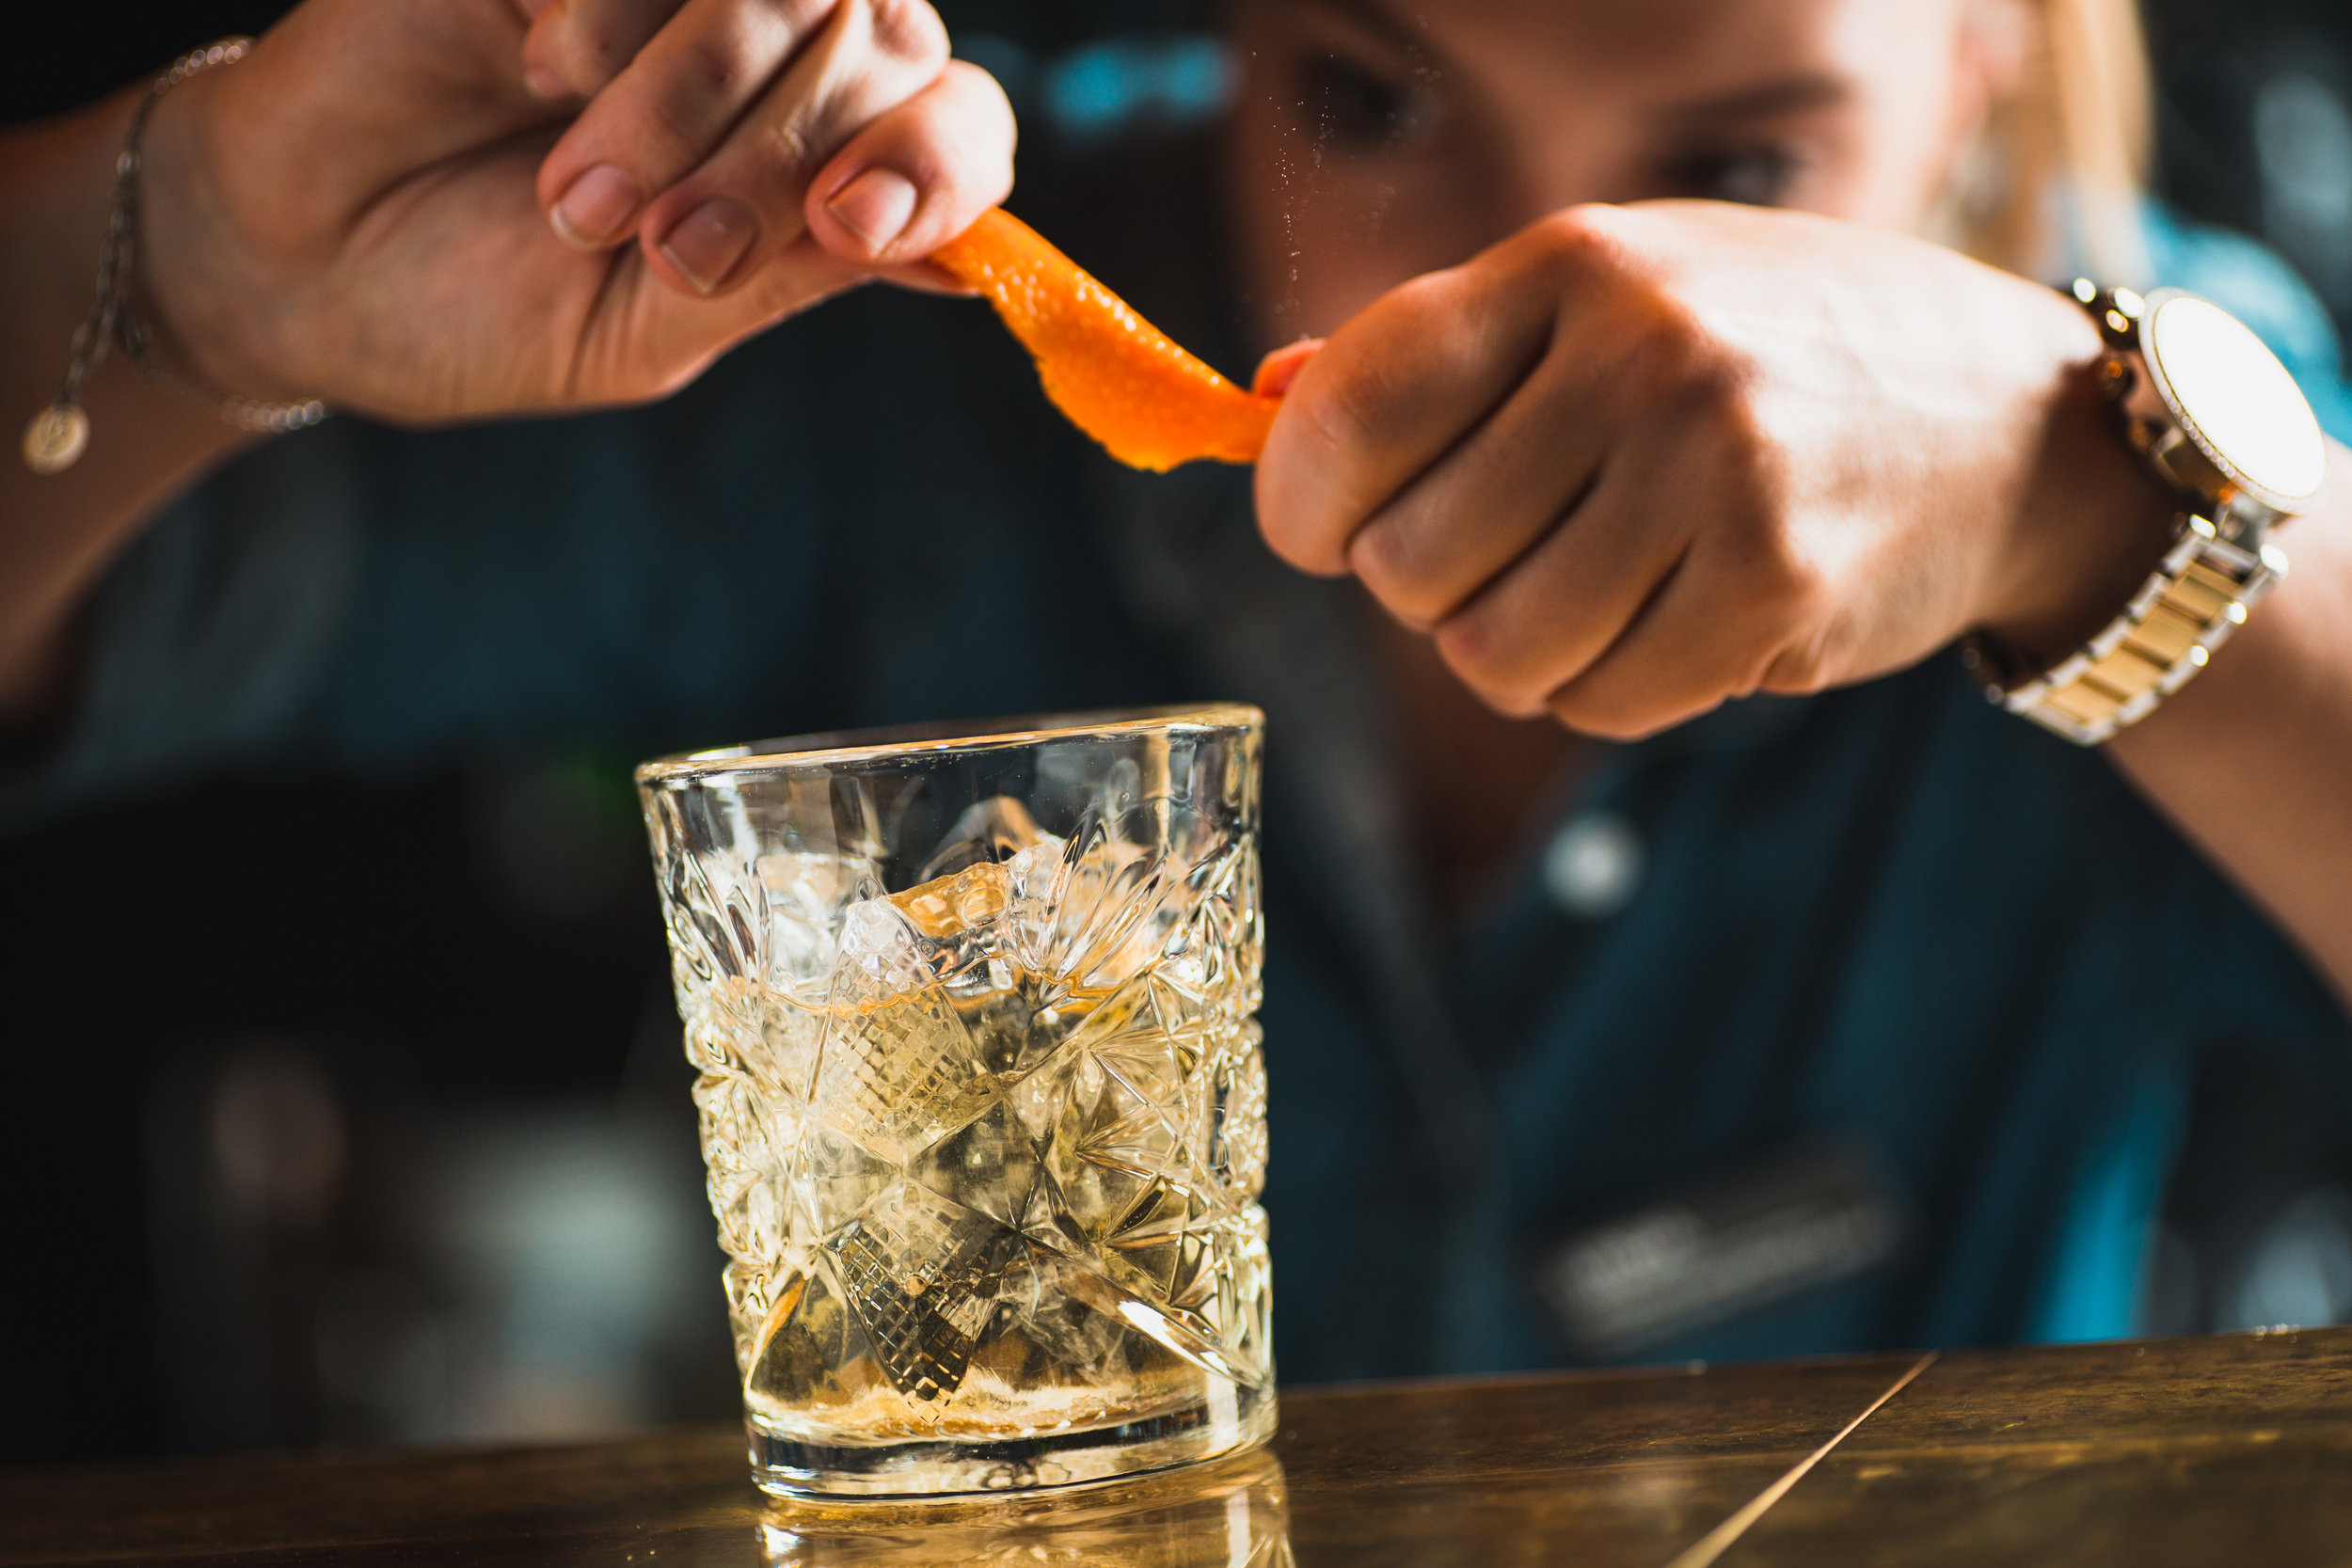 Quality-Hotel-Friends-BrasserieX-drink-zest.jpg